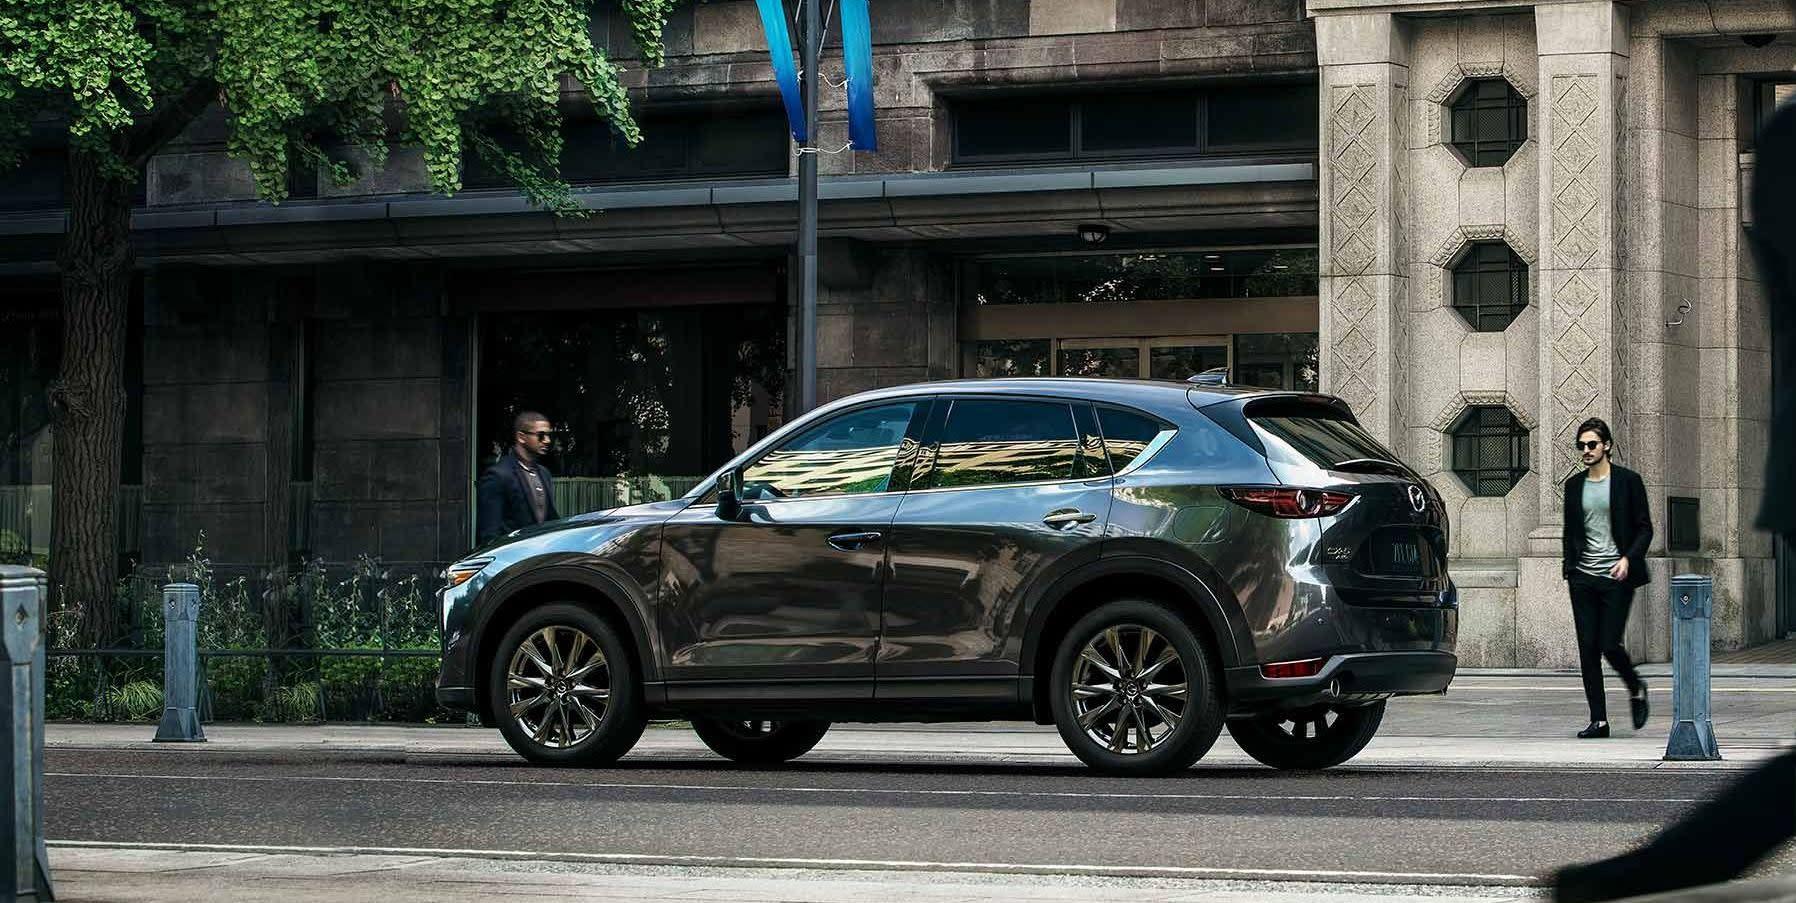 2019 Mazda CX-5 for Sale near College Station, TX